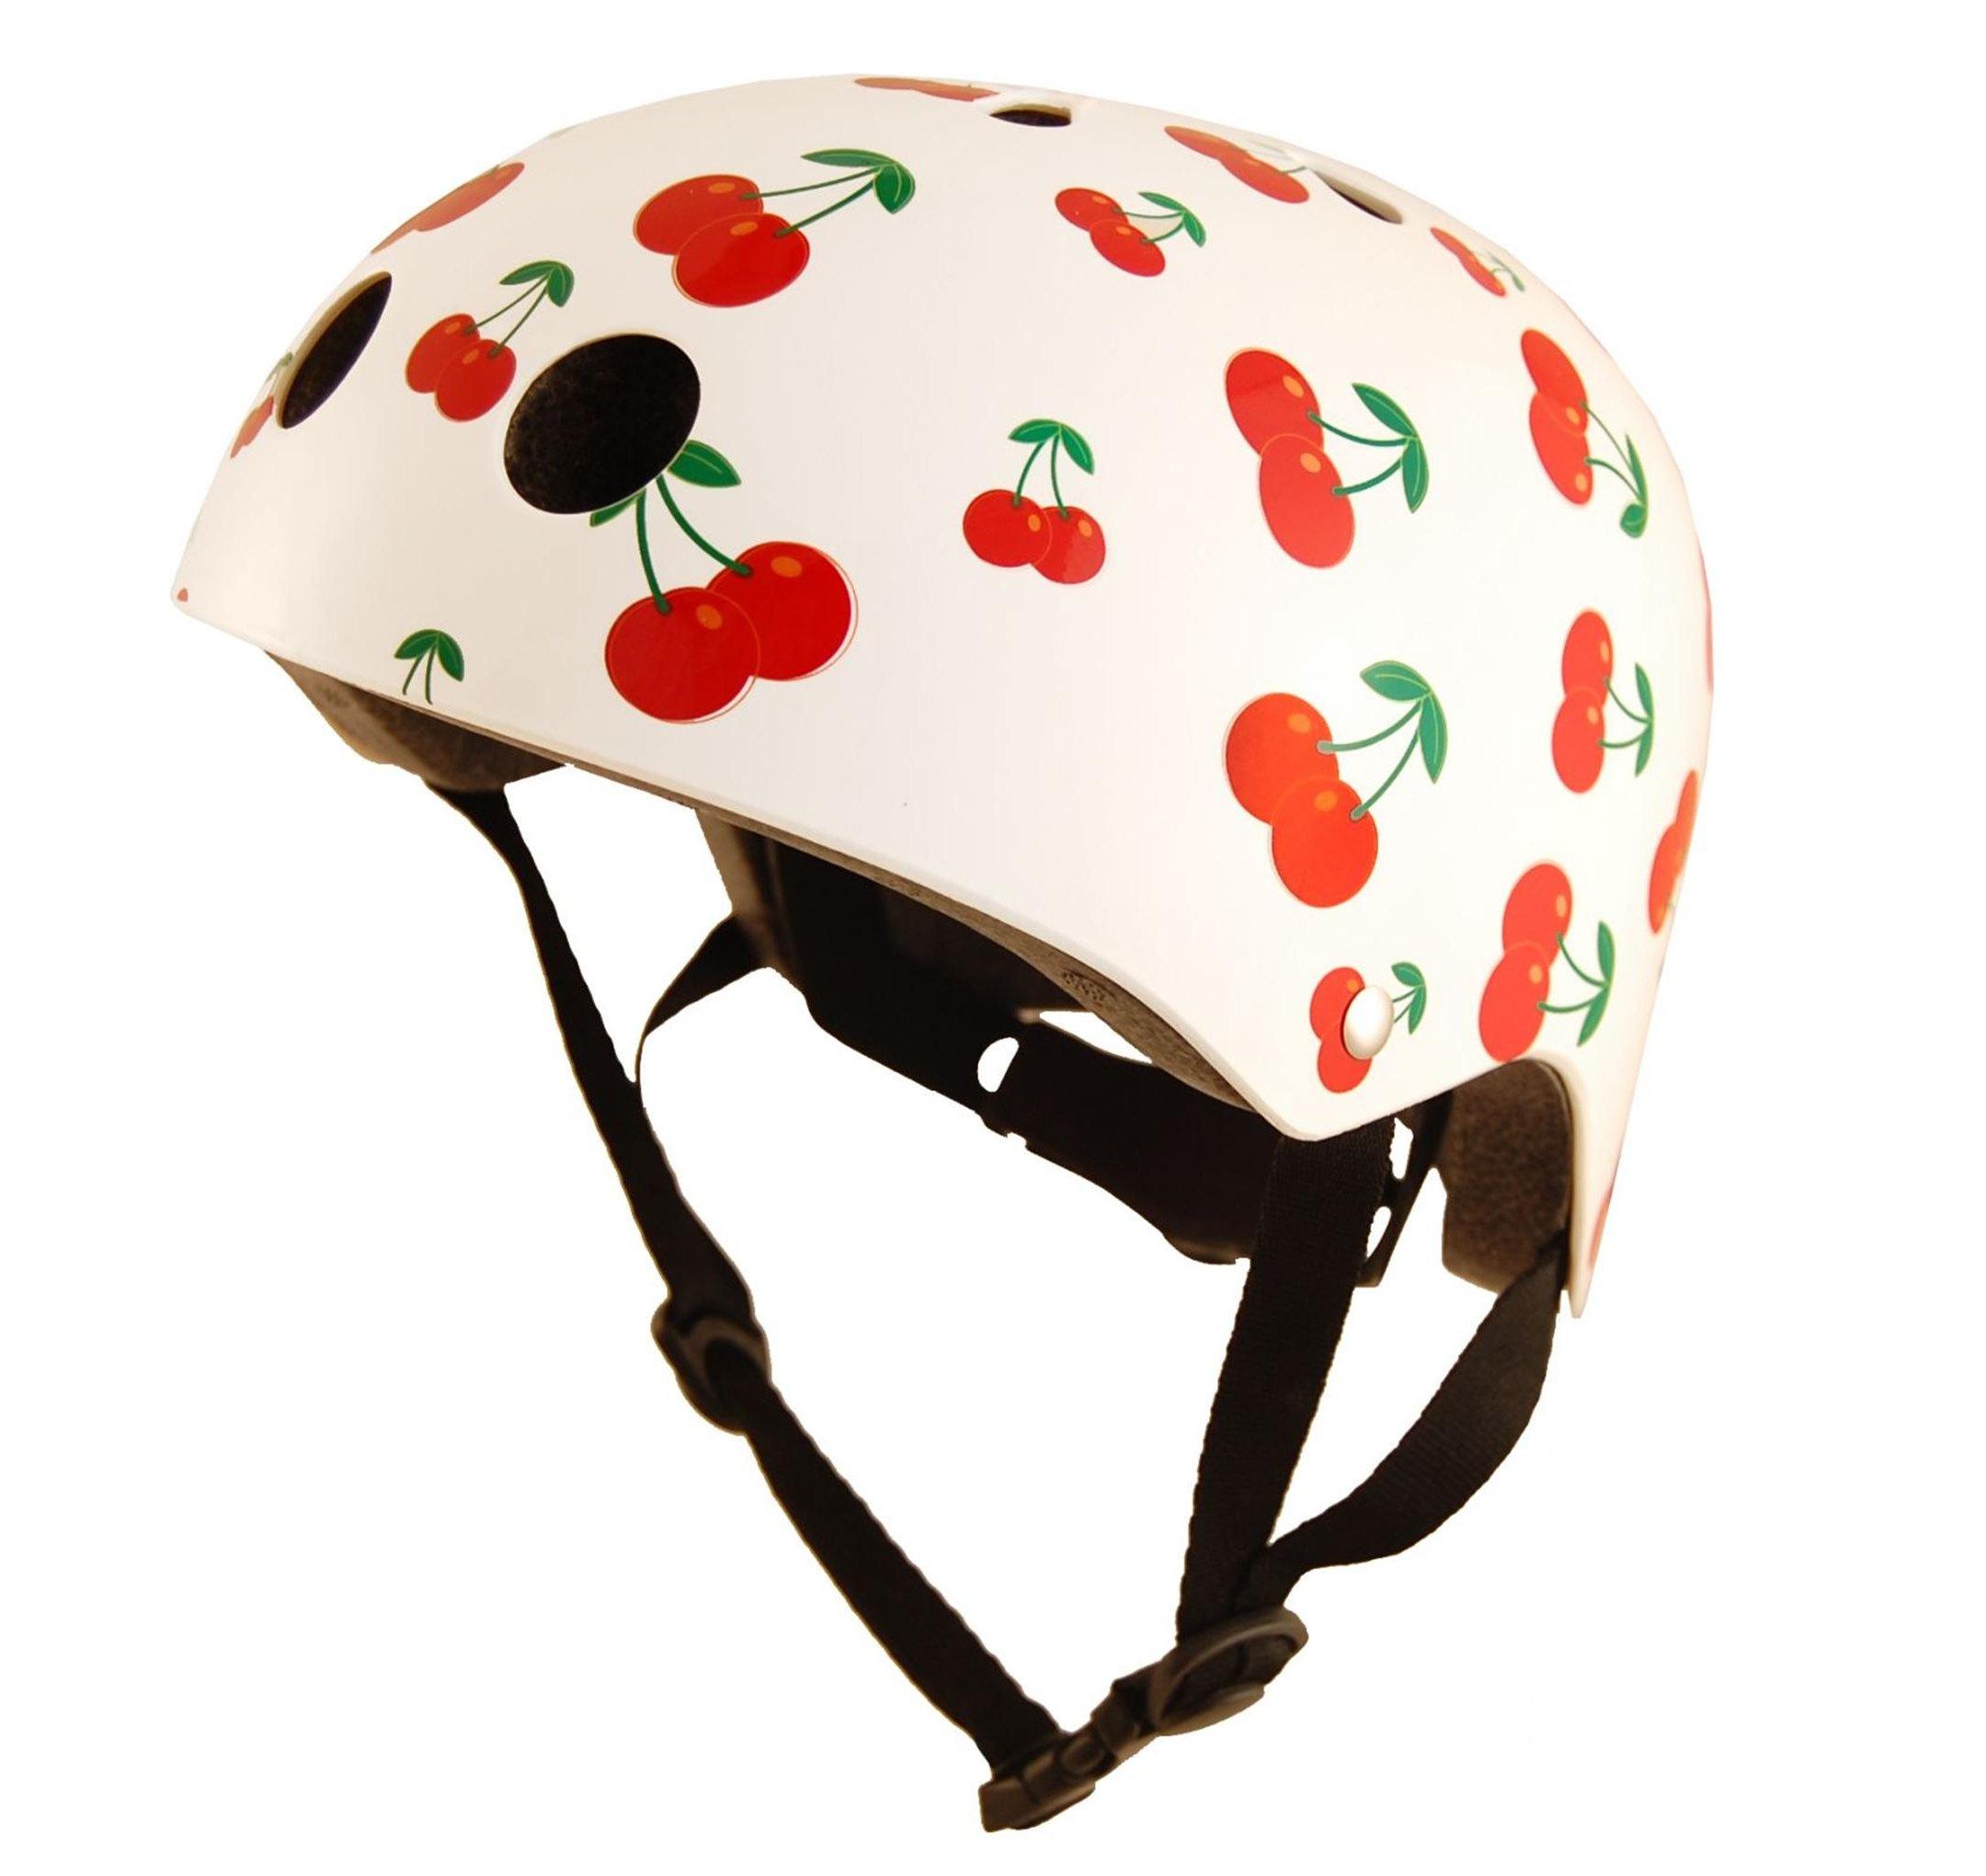 cherry helmet small for children kids in s a. Black Bedroom Furniture Sets. Home Design Ideas